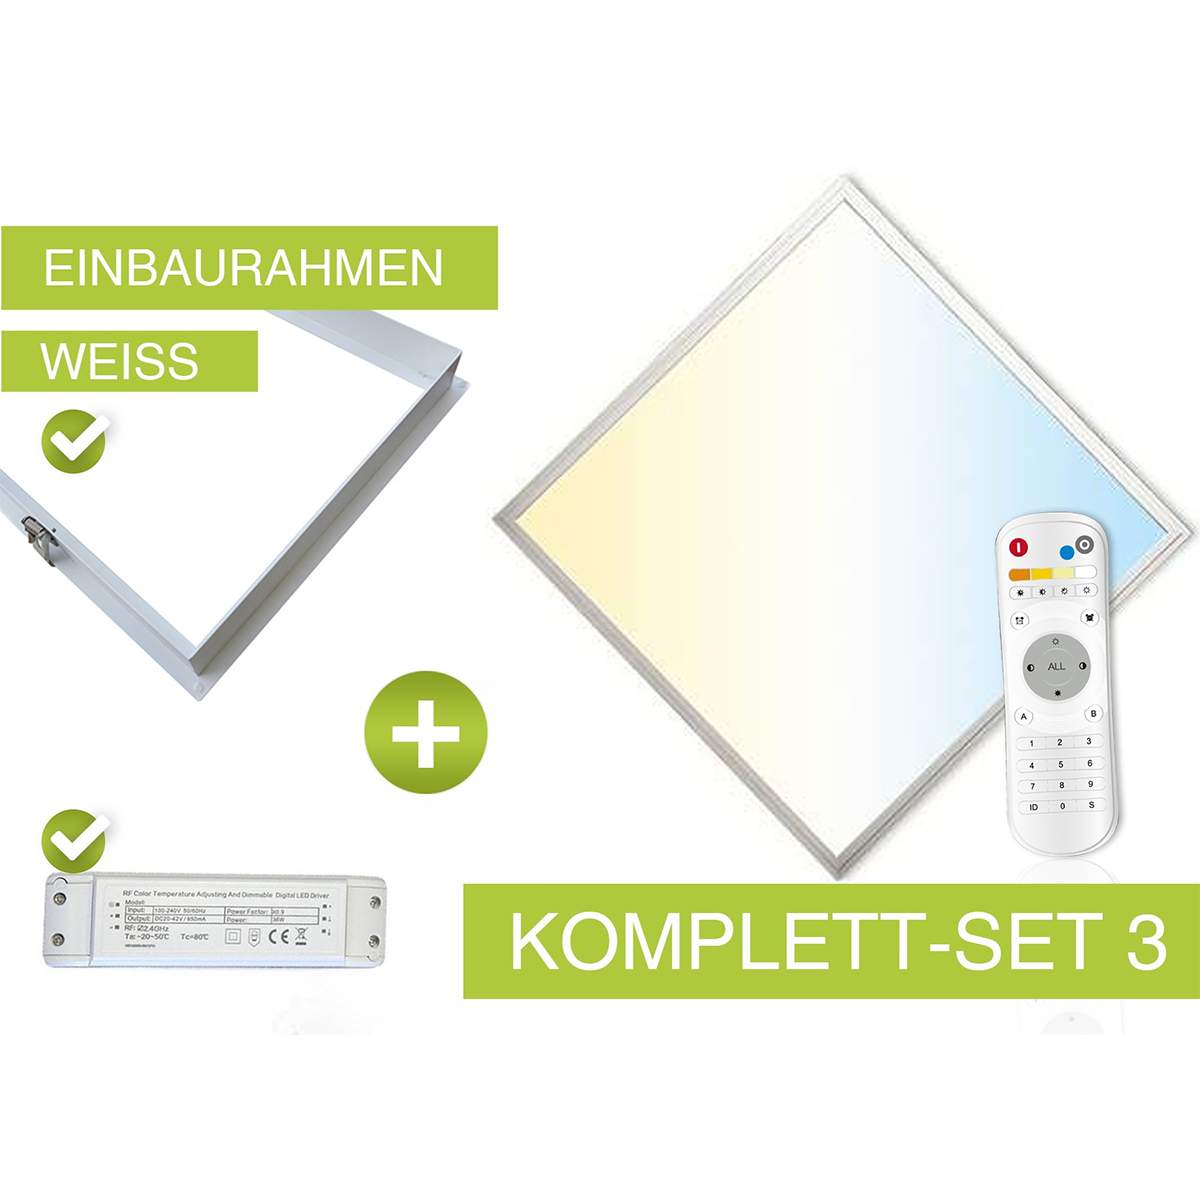 CCT LED Panel Set 3 62x62cm 36W 3000K-6000K weiss